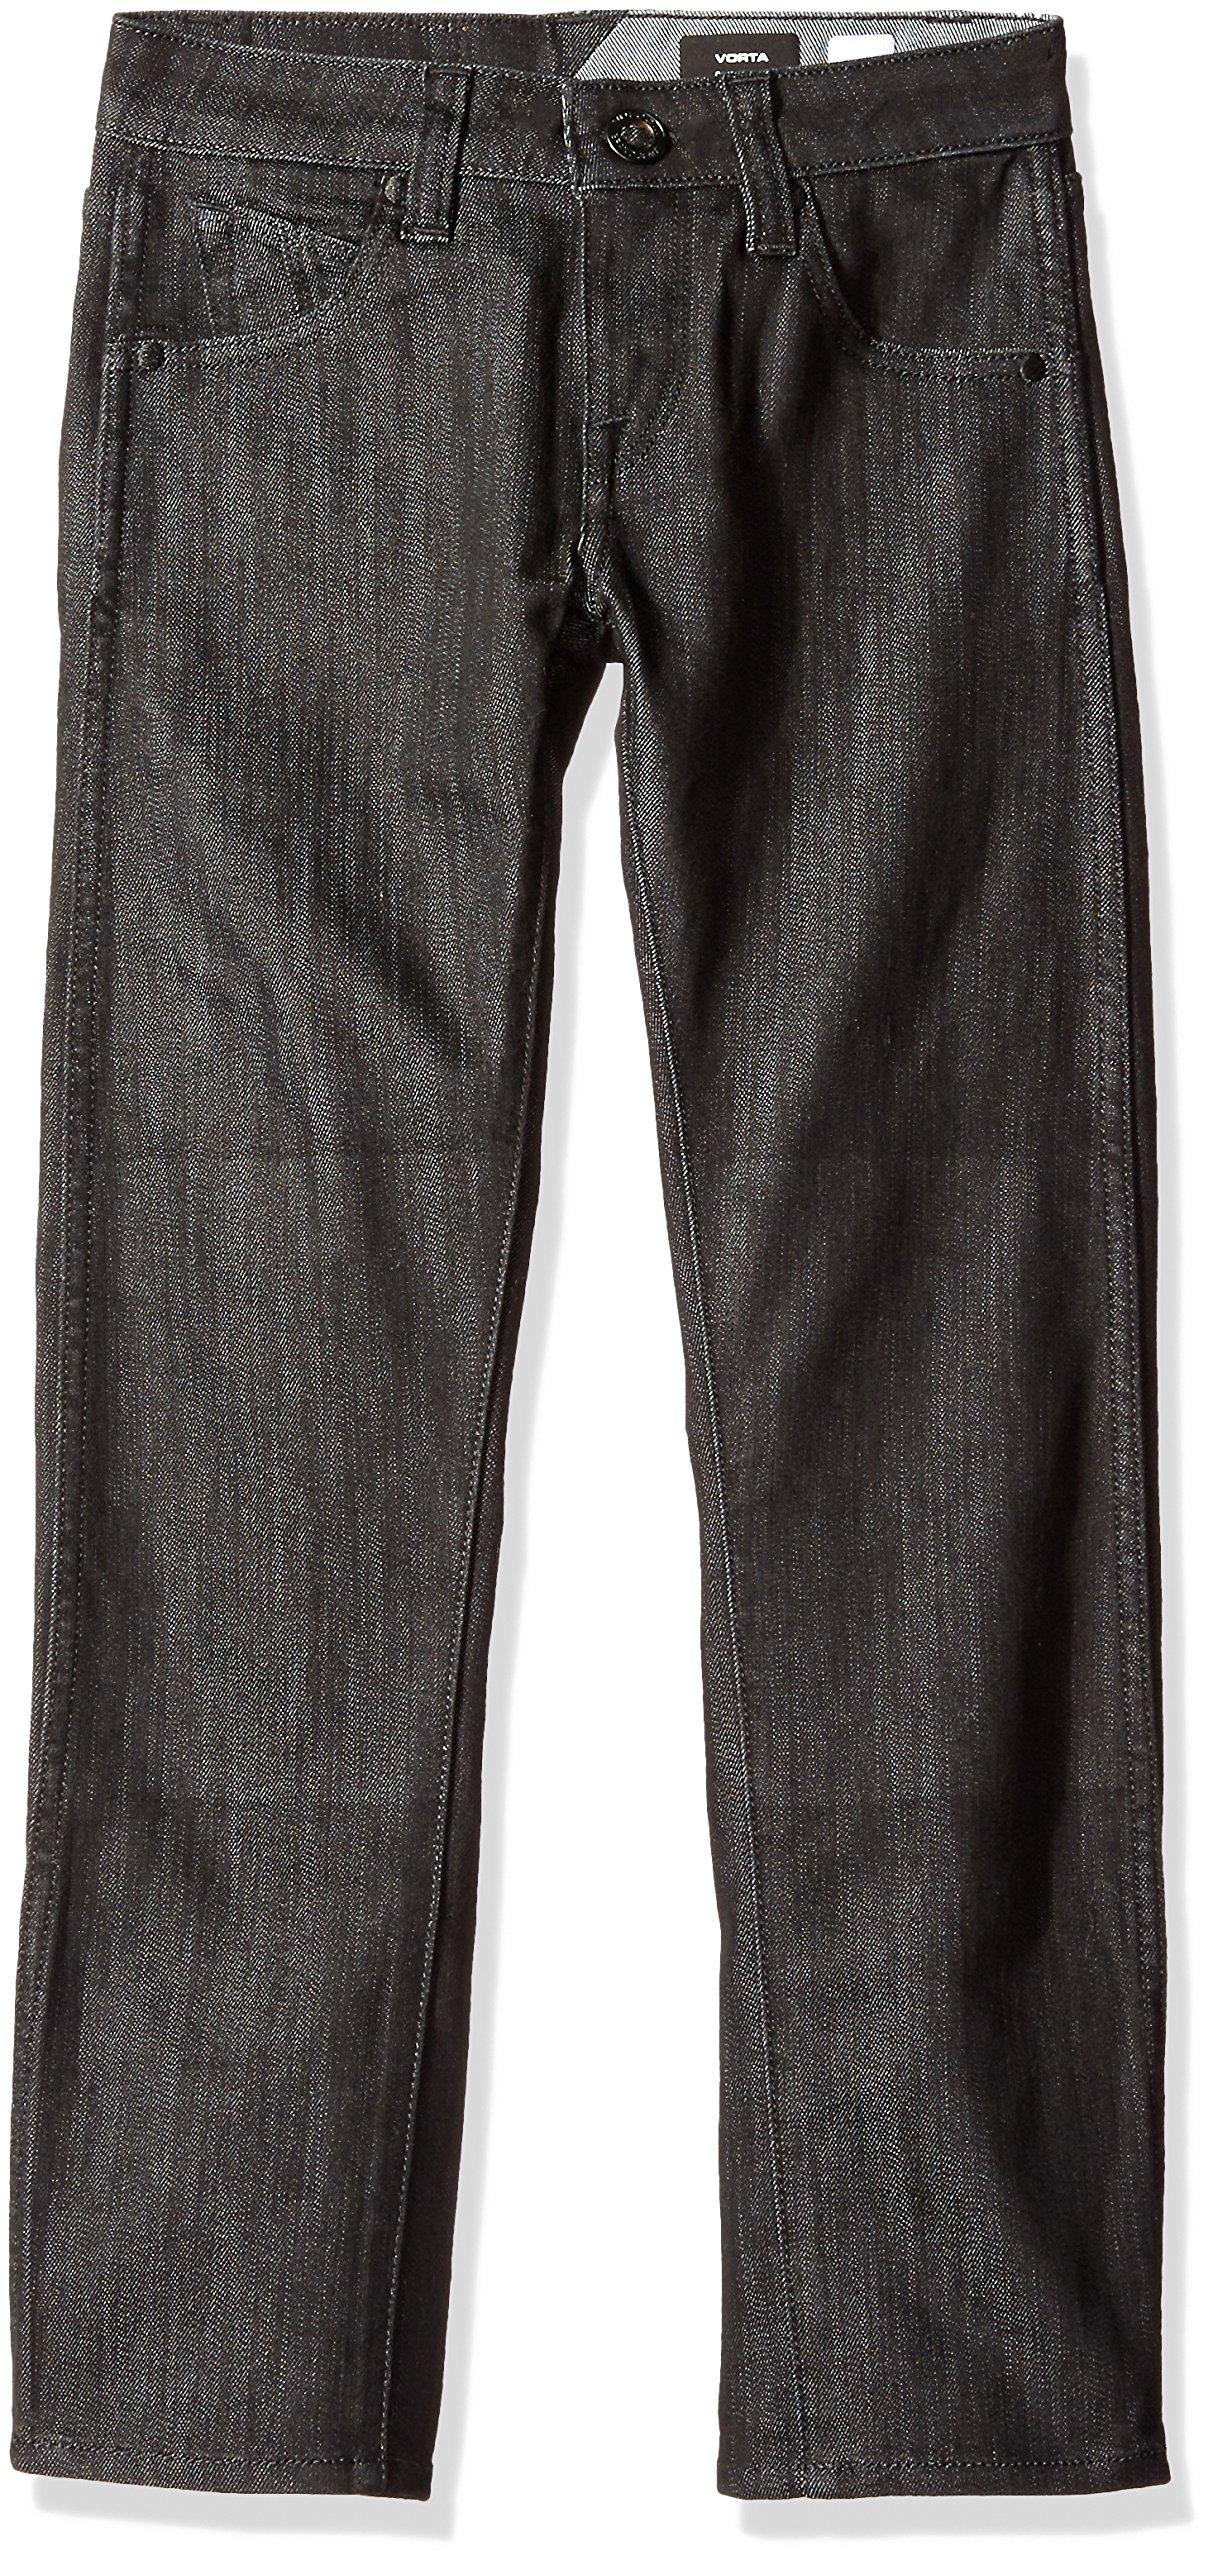 Volcom Big Boys' Vorta Form Jeans, Black Top, 22